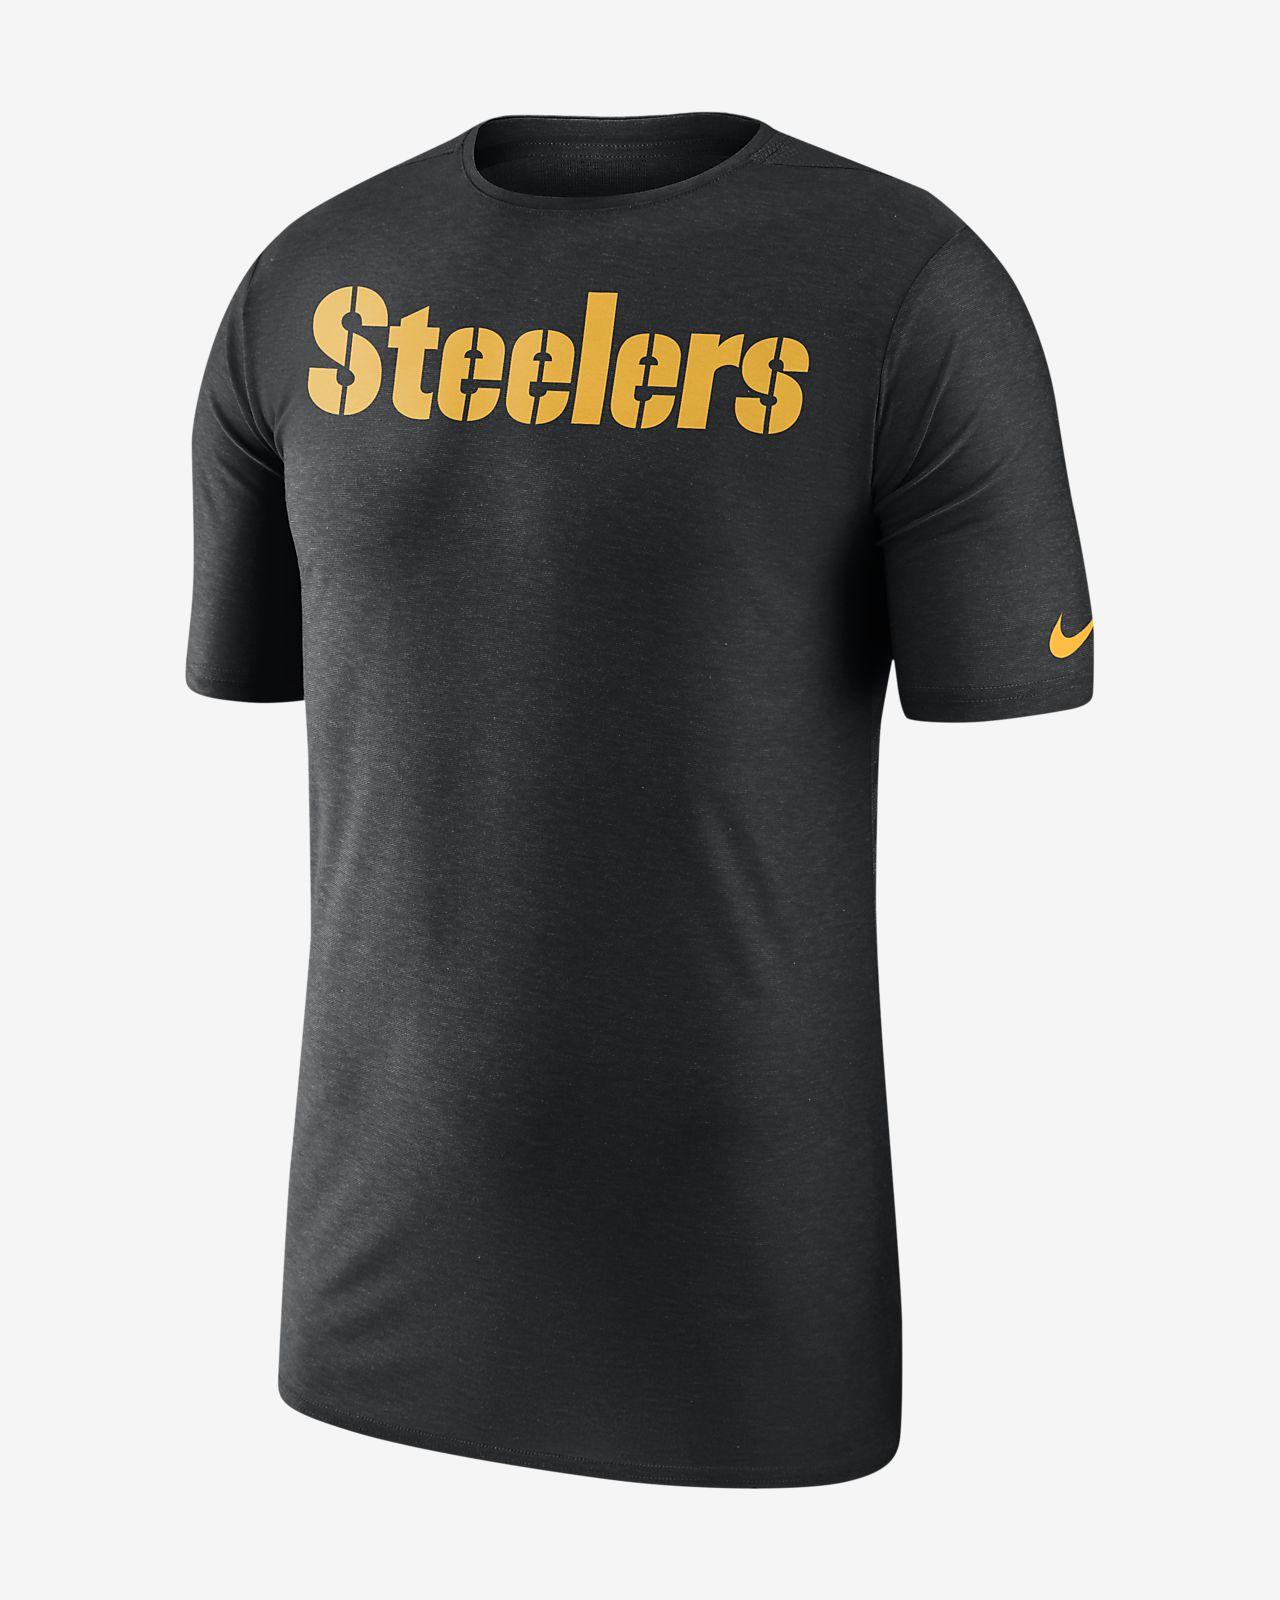 Nike Dri-FIT Player (NFL Steelers) Men's Short Sleeve Top